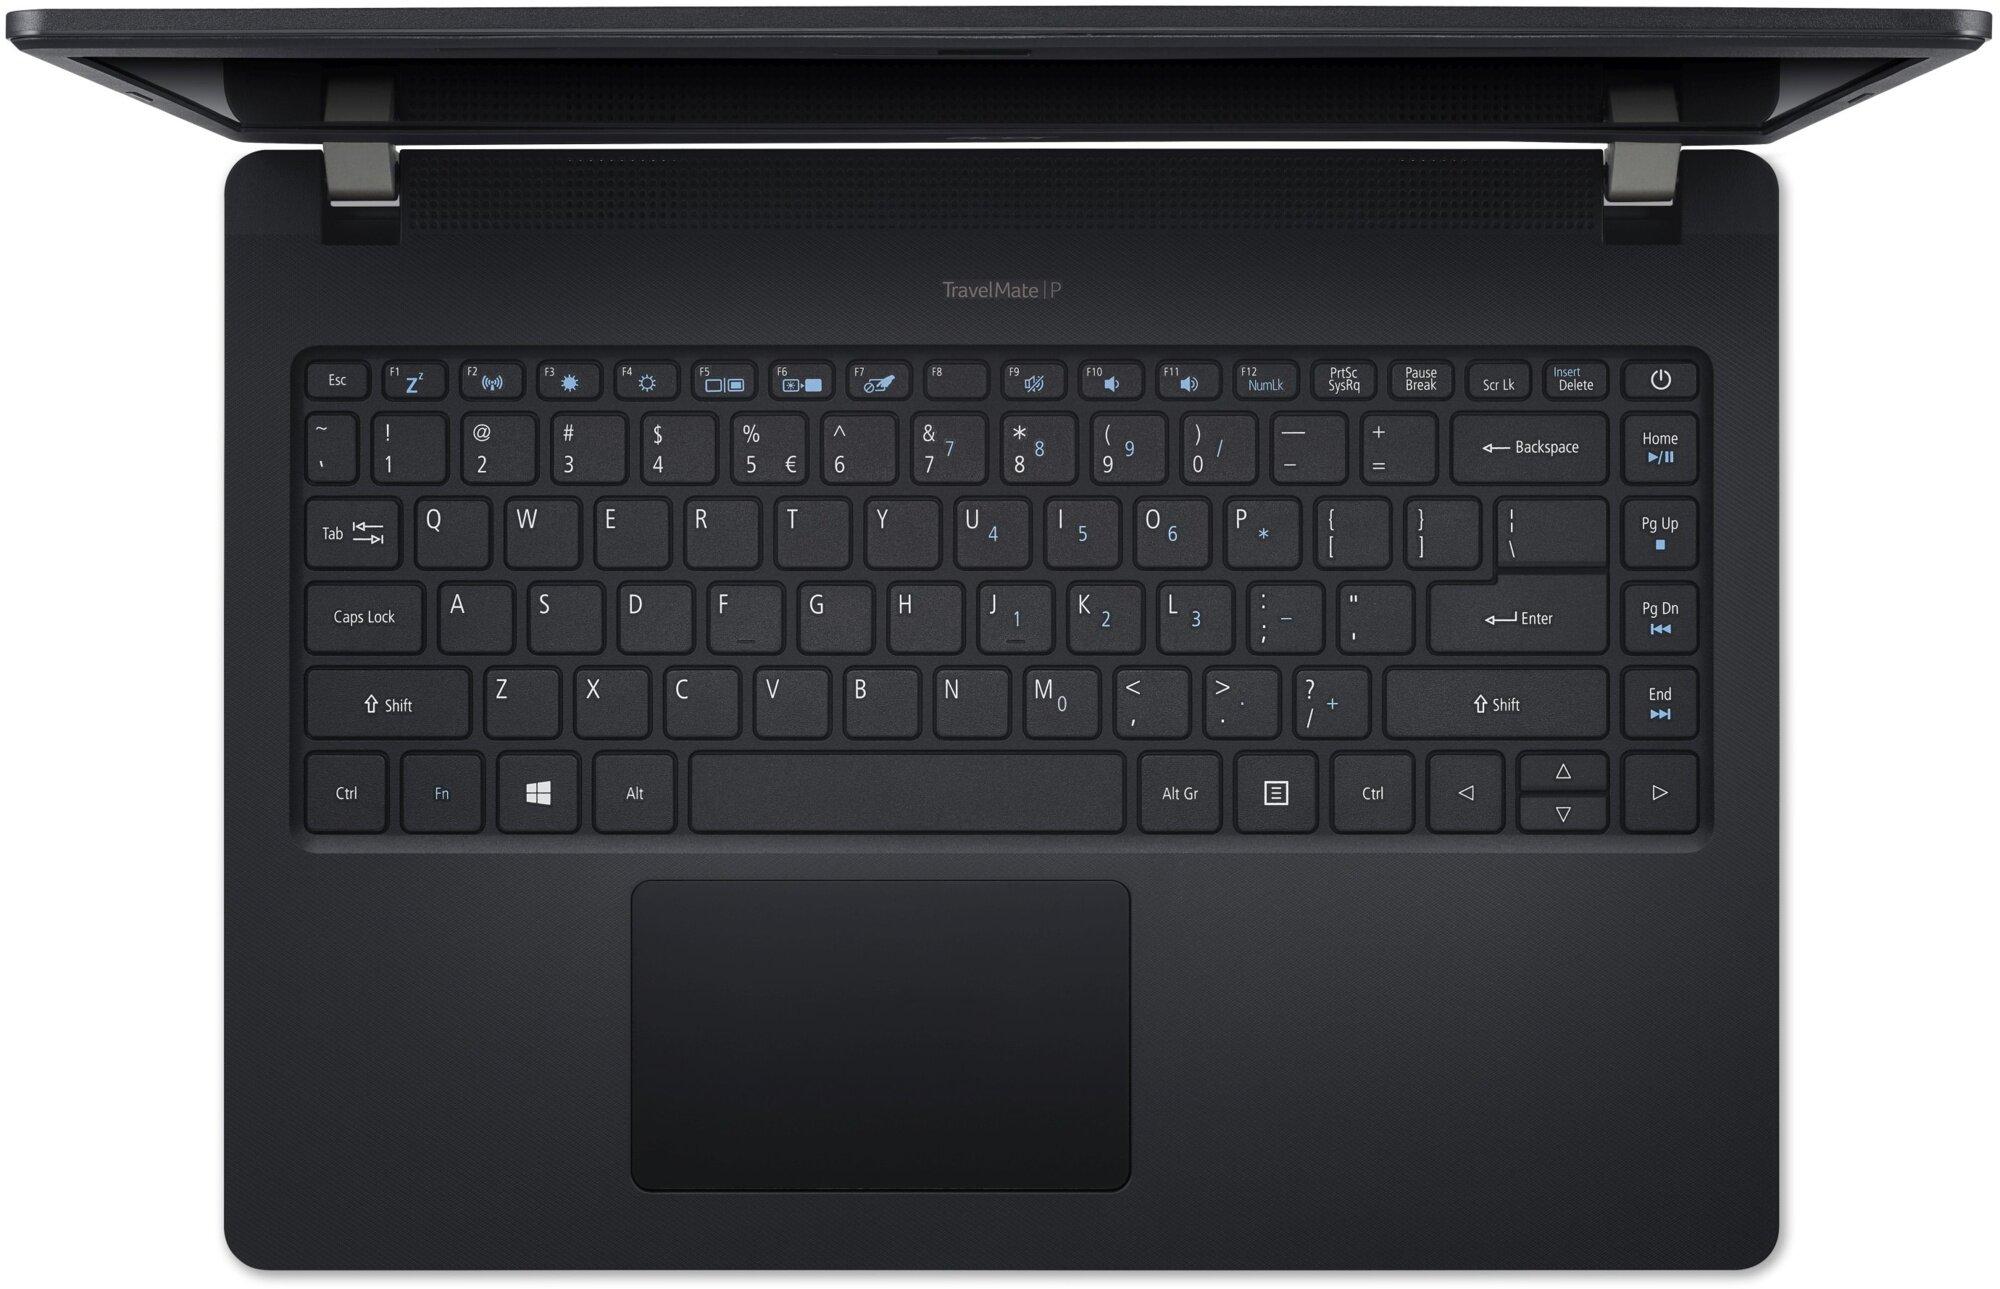 Acer TravelMate P214-53